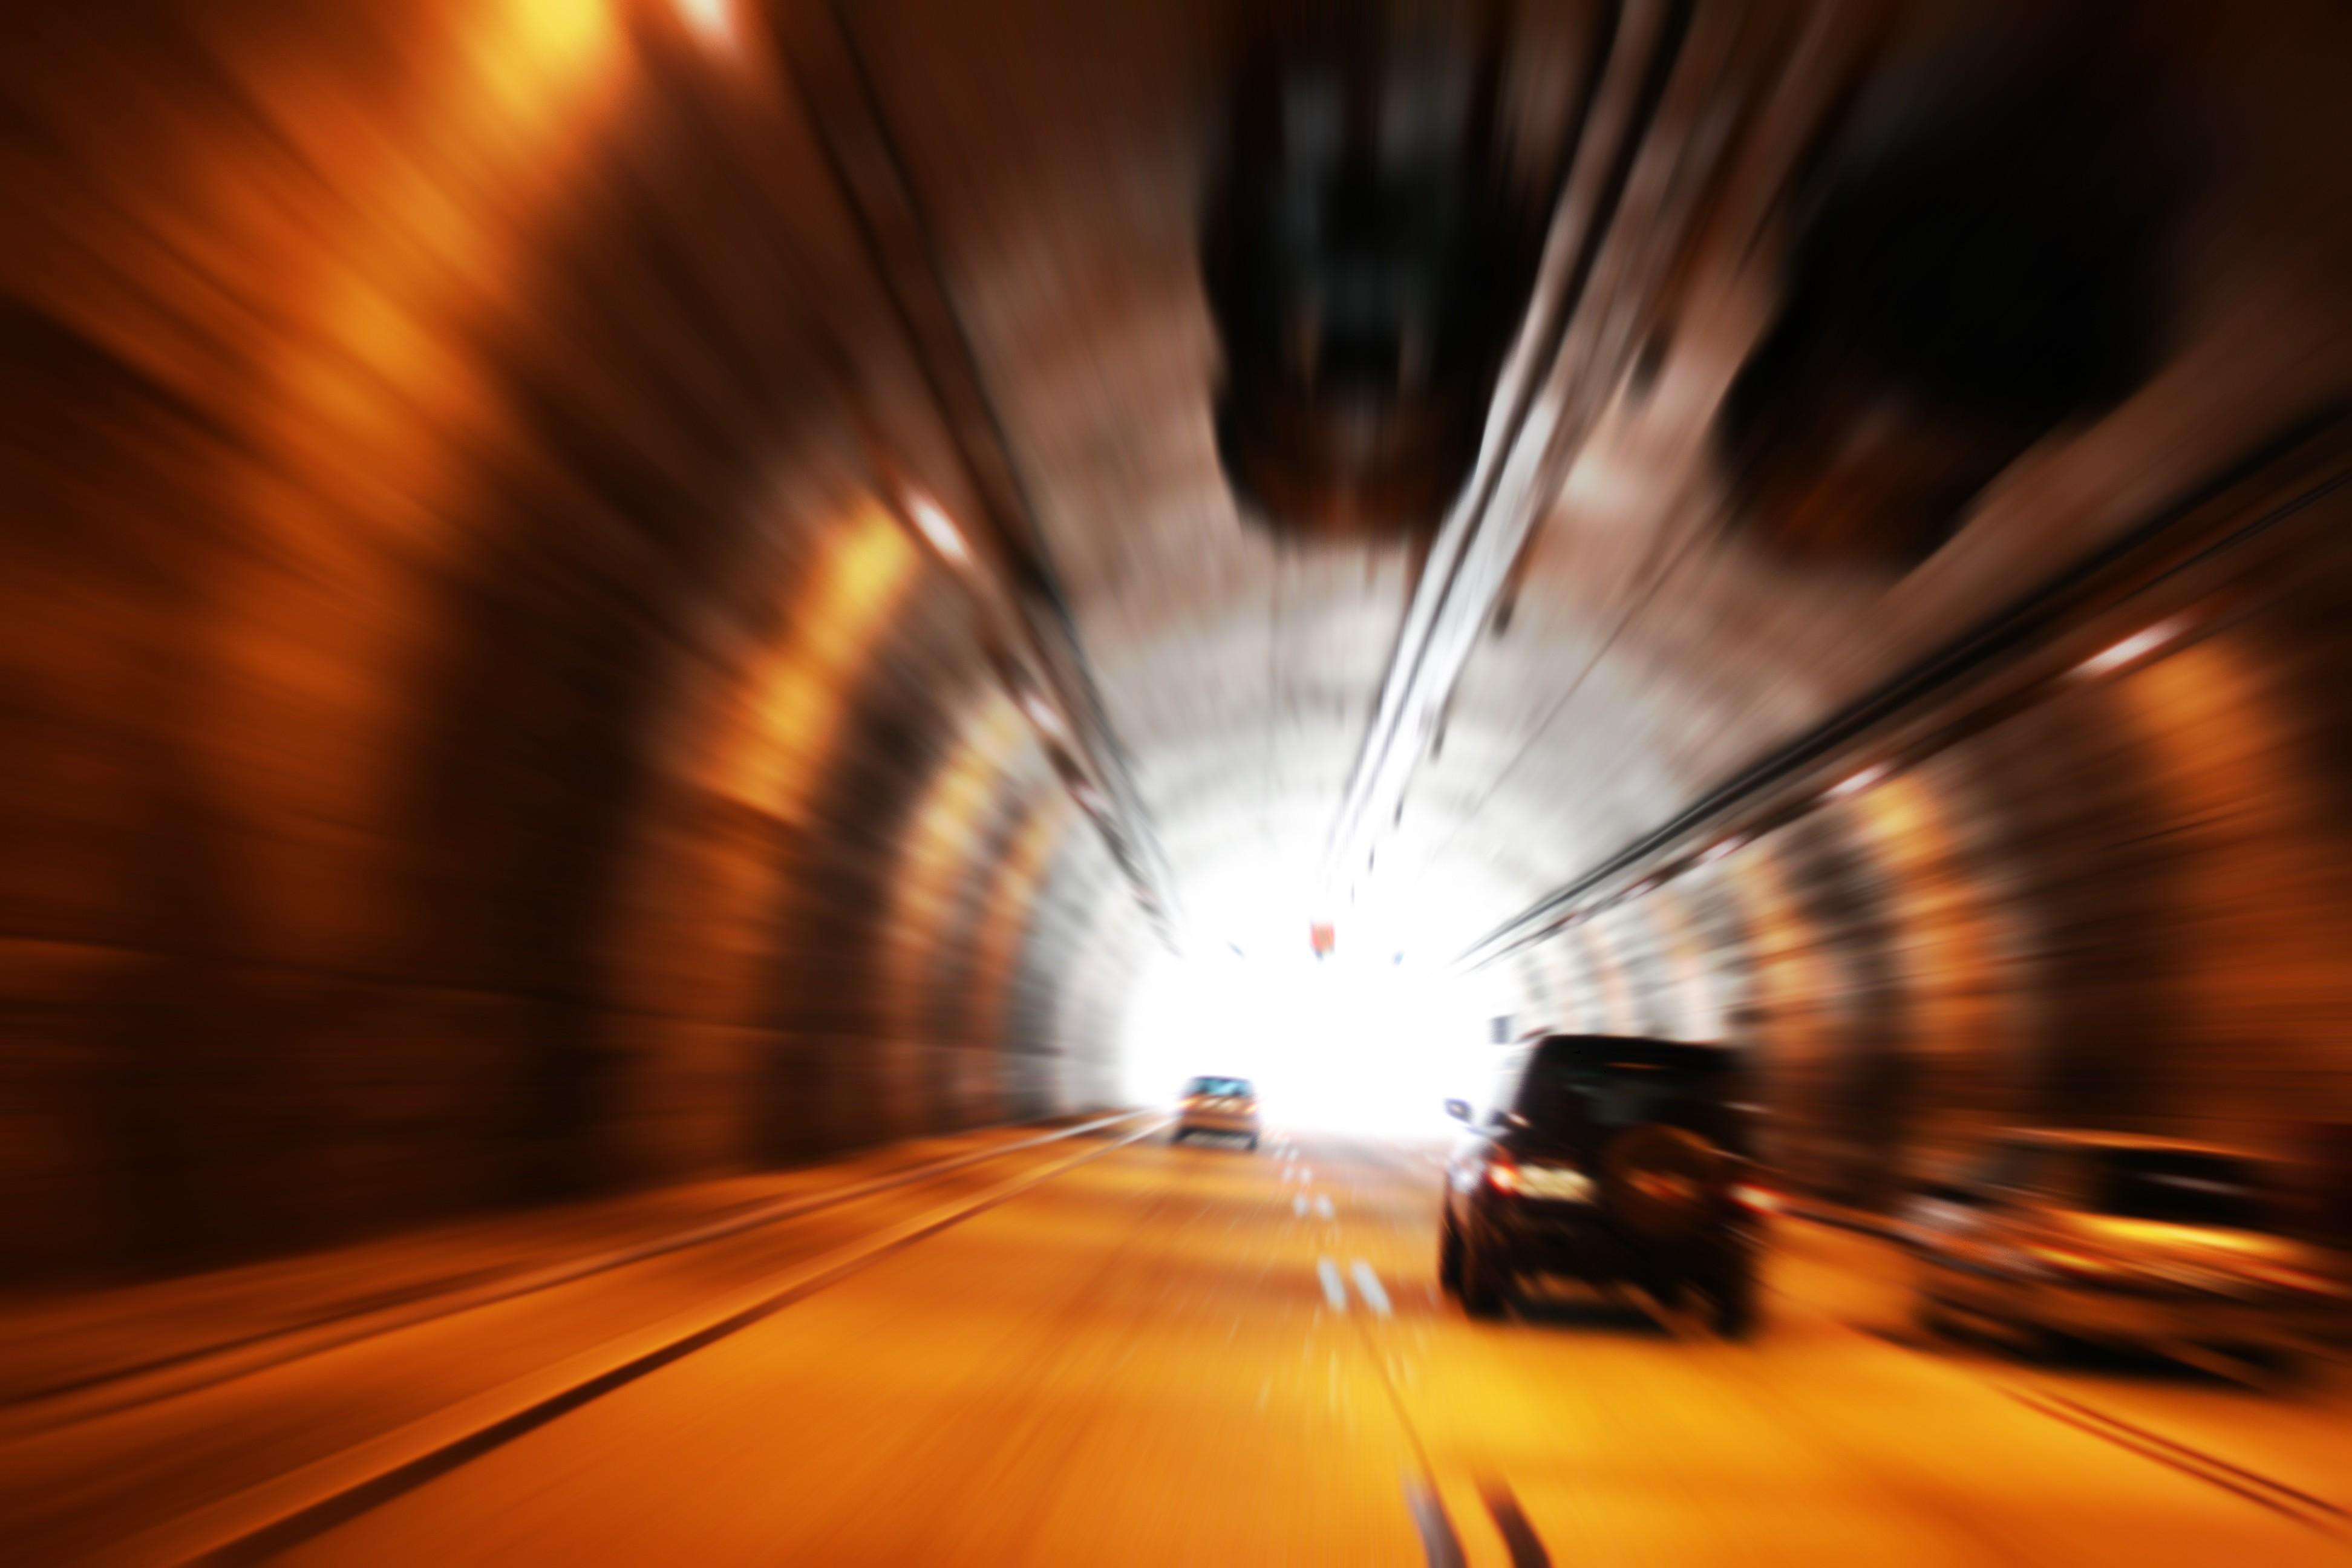 tunnel-4-1163170.jpg